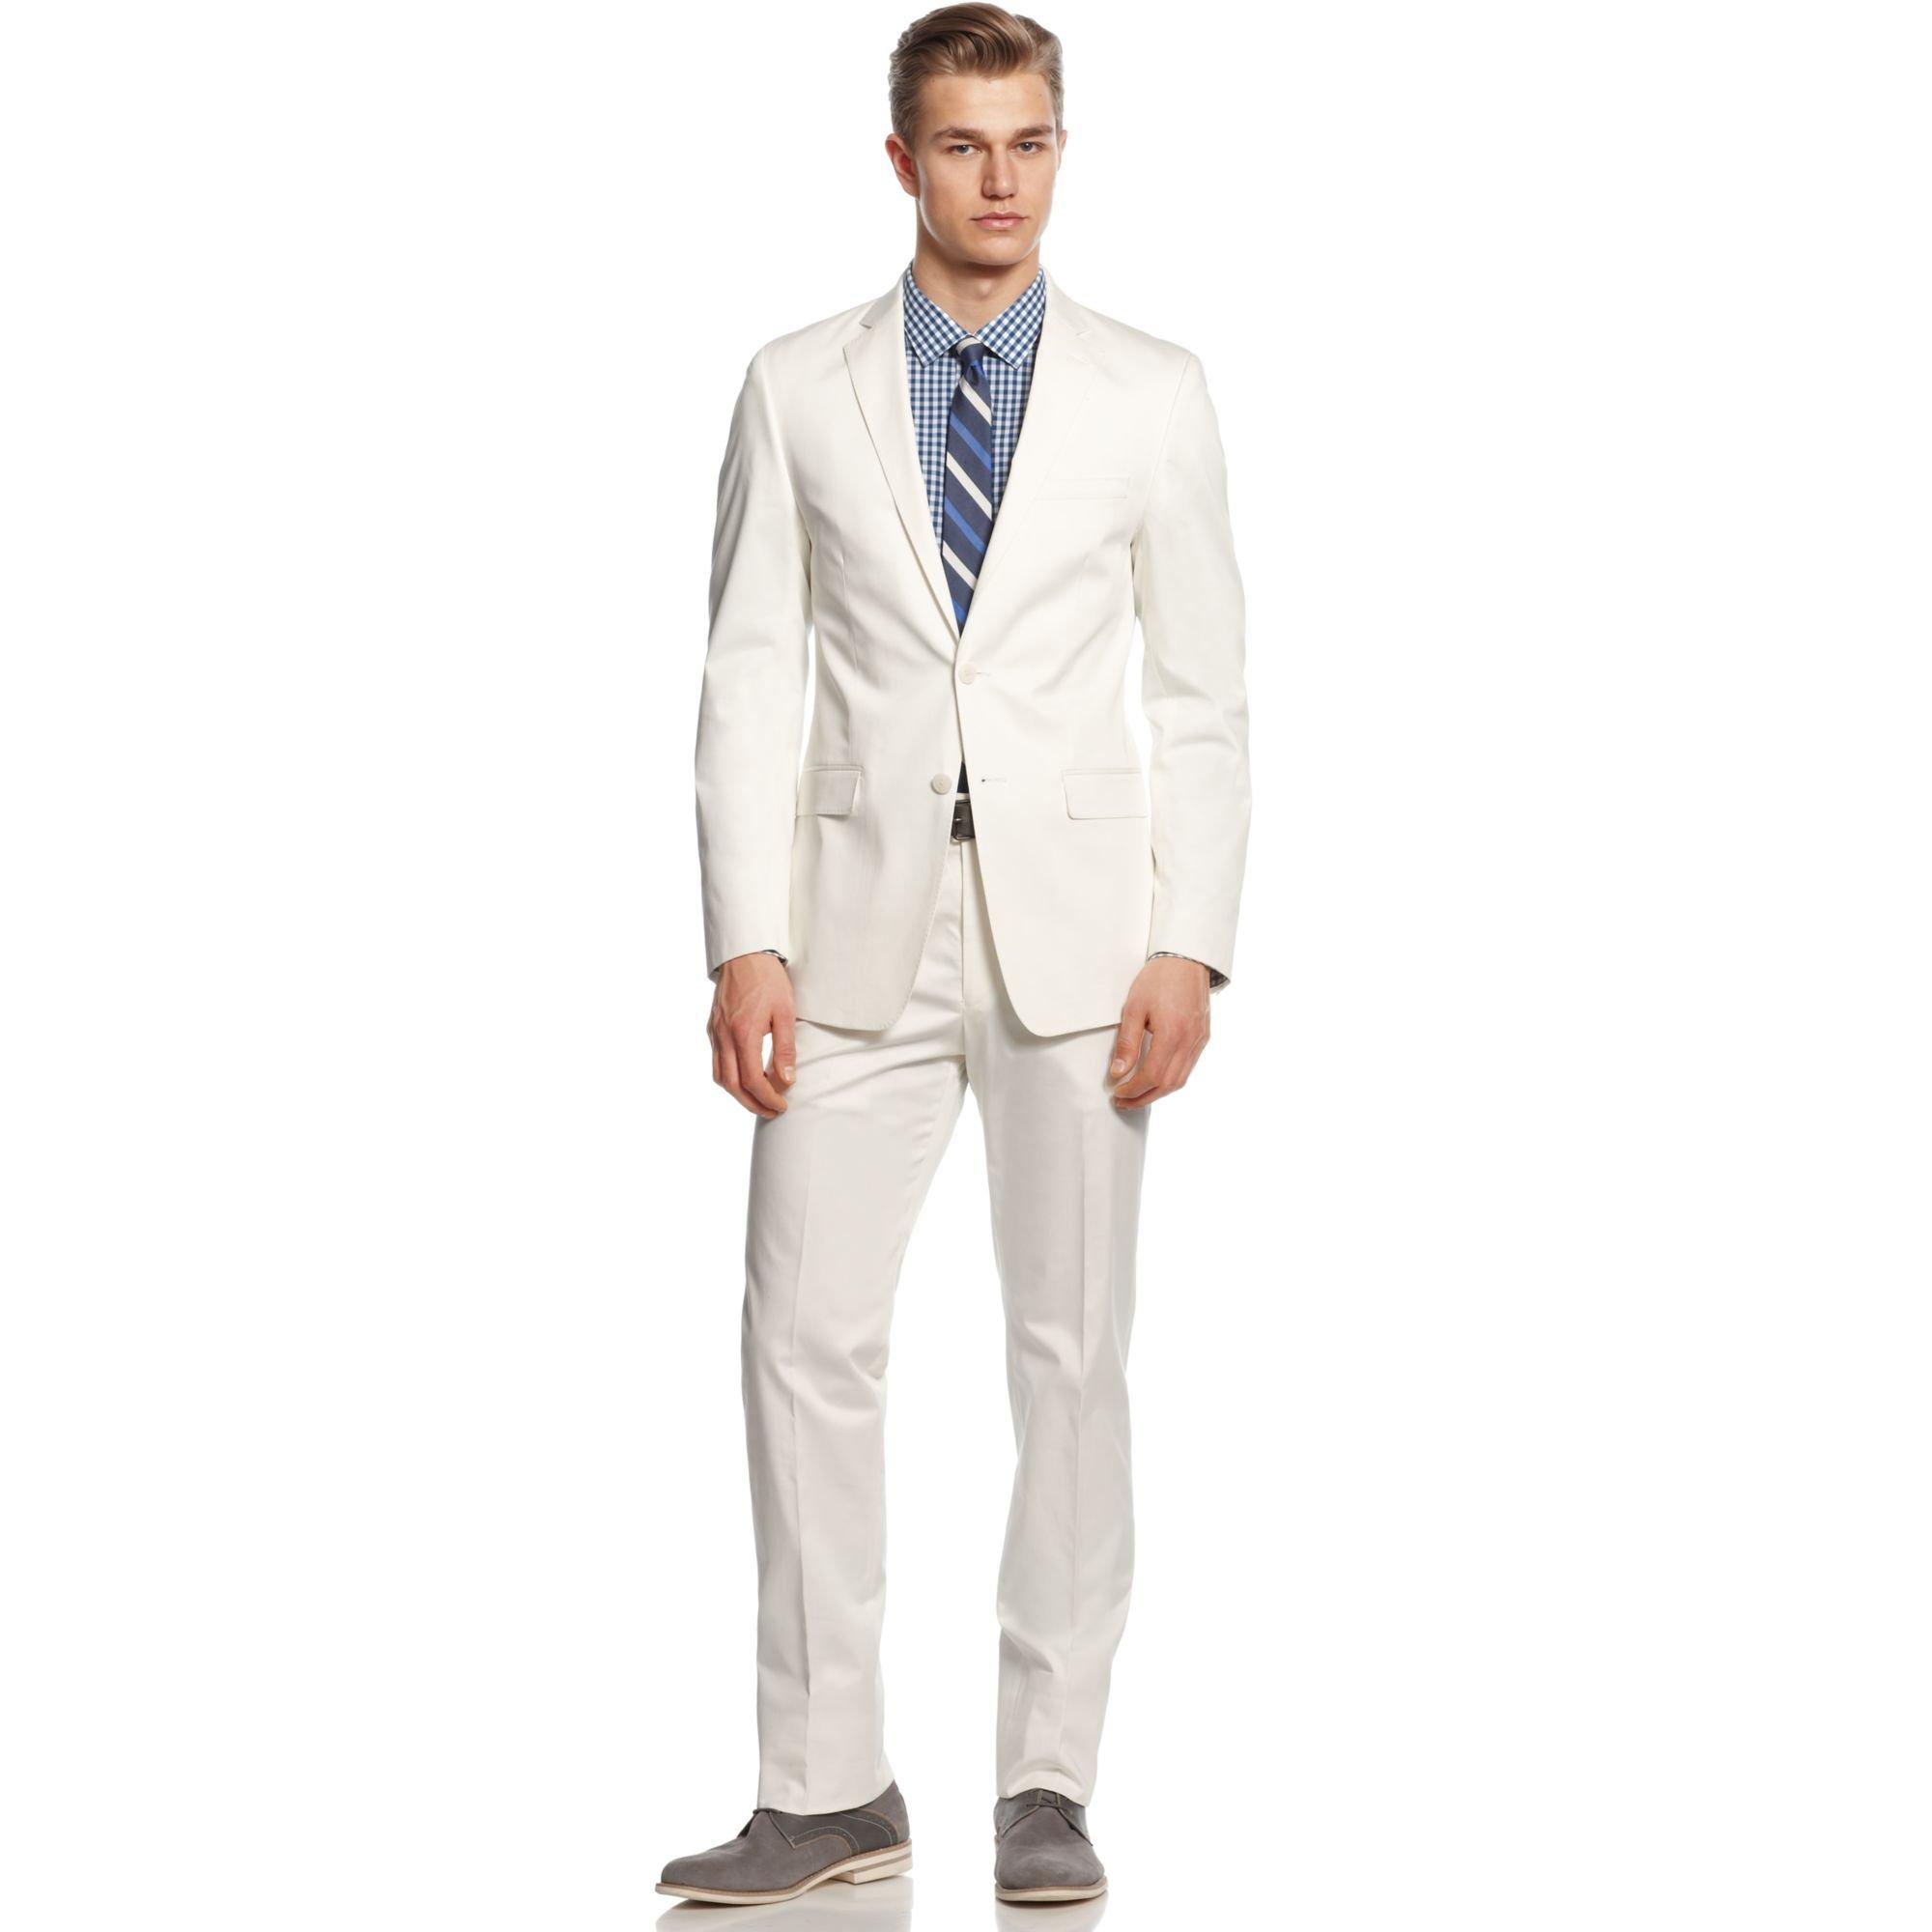 Calvin klein Suit White Cotton Slim Fit in White for Men | Lyst